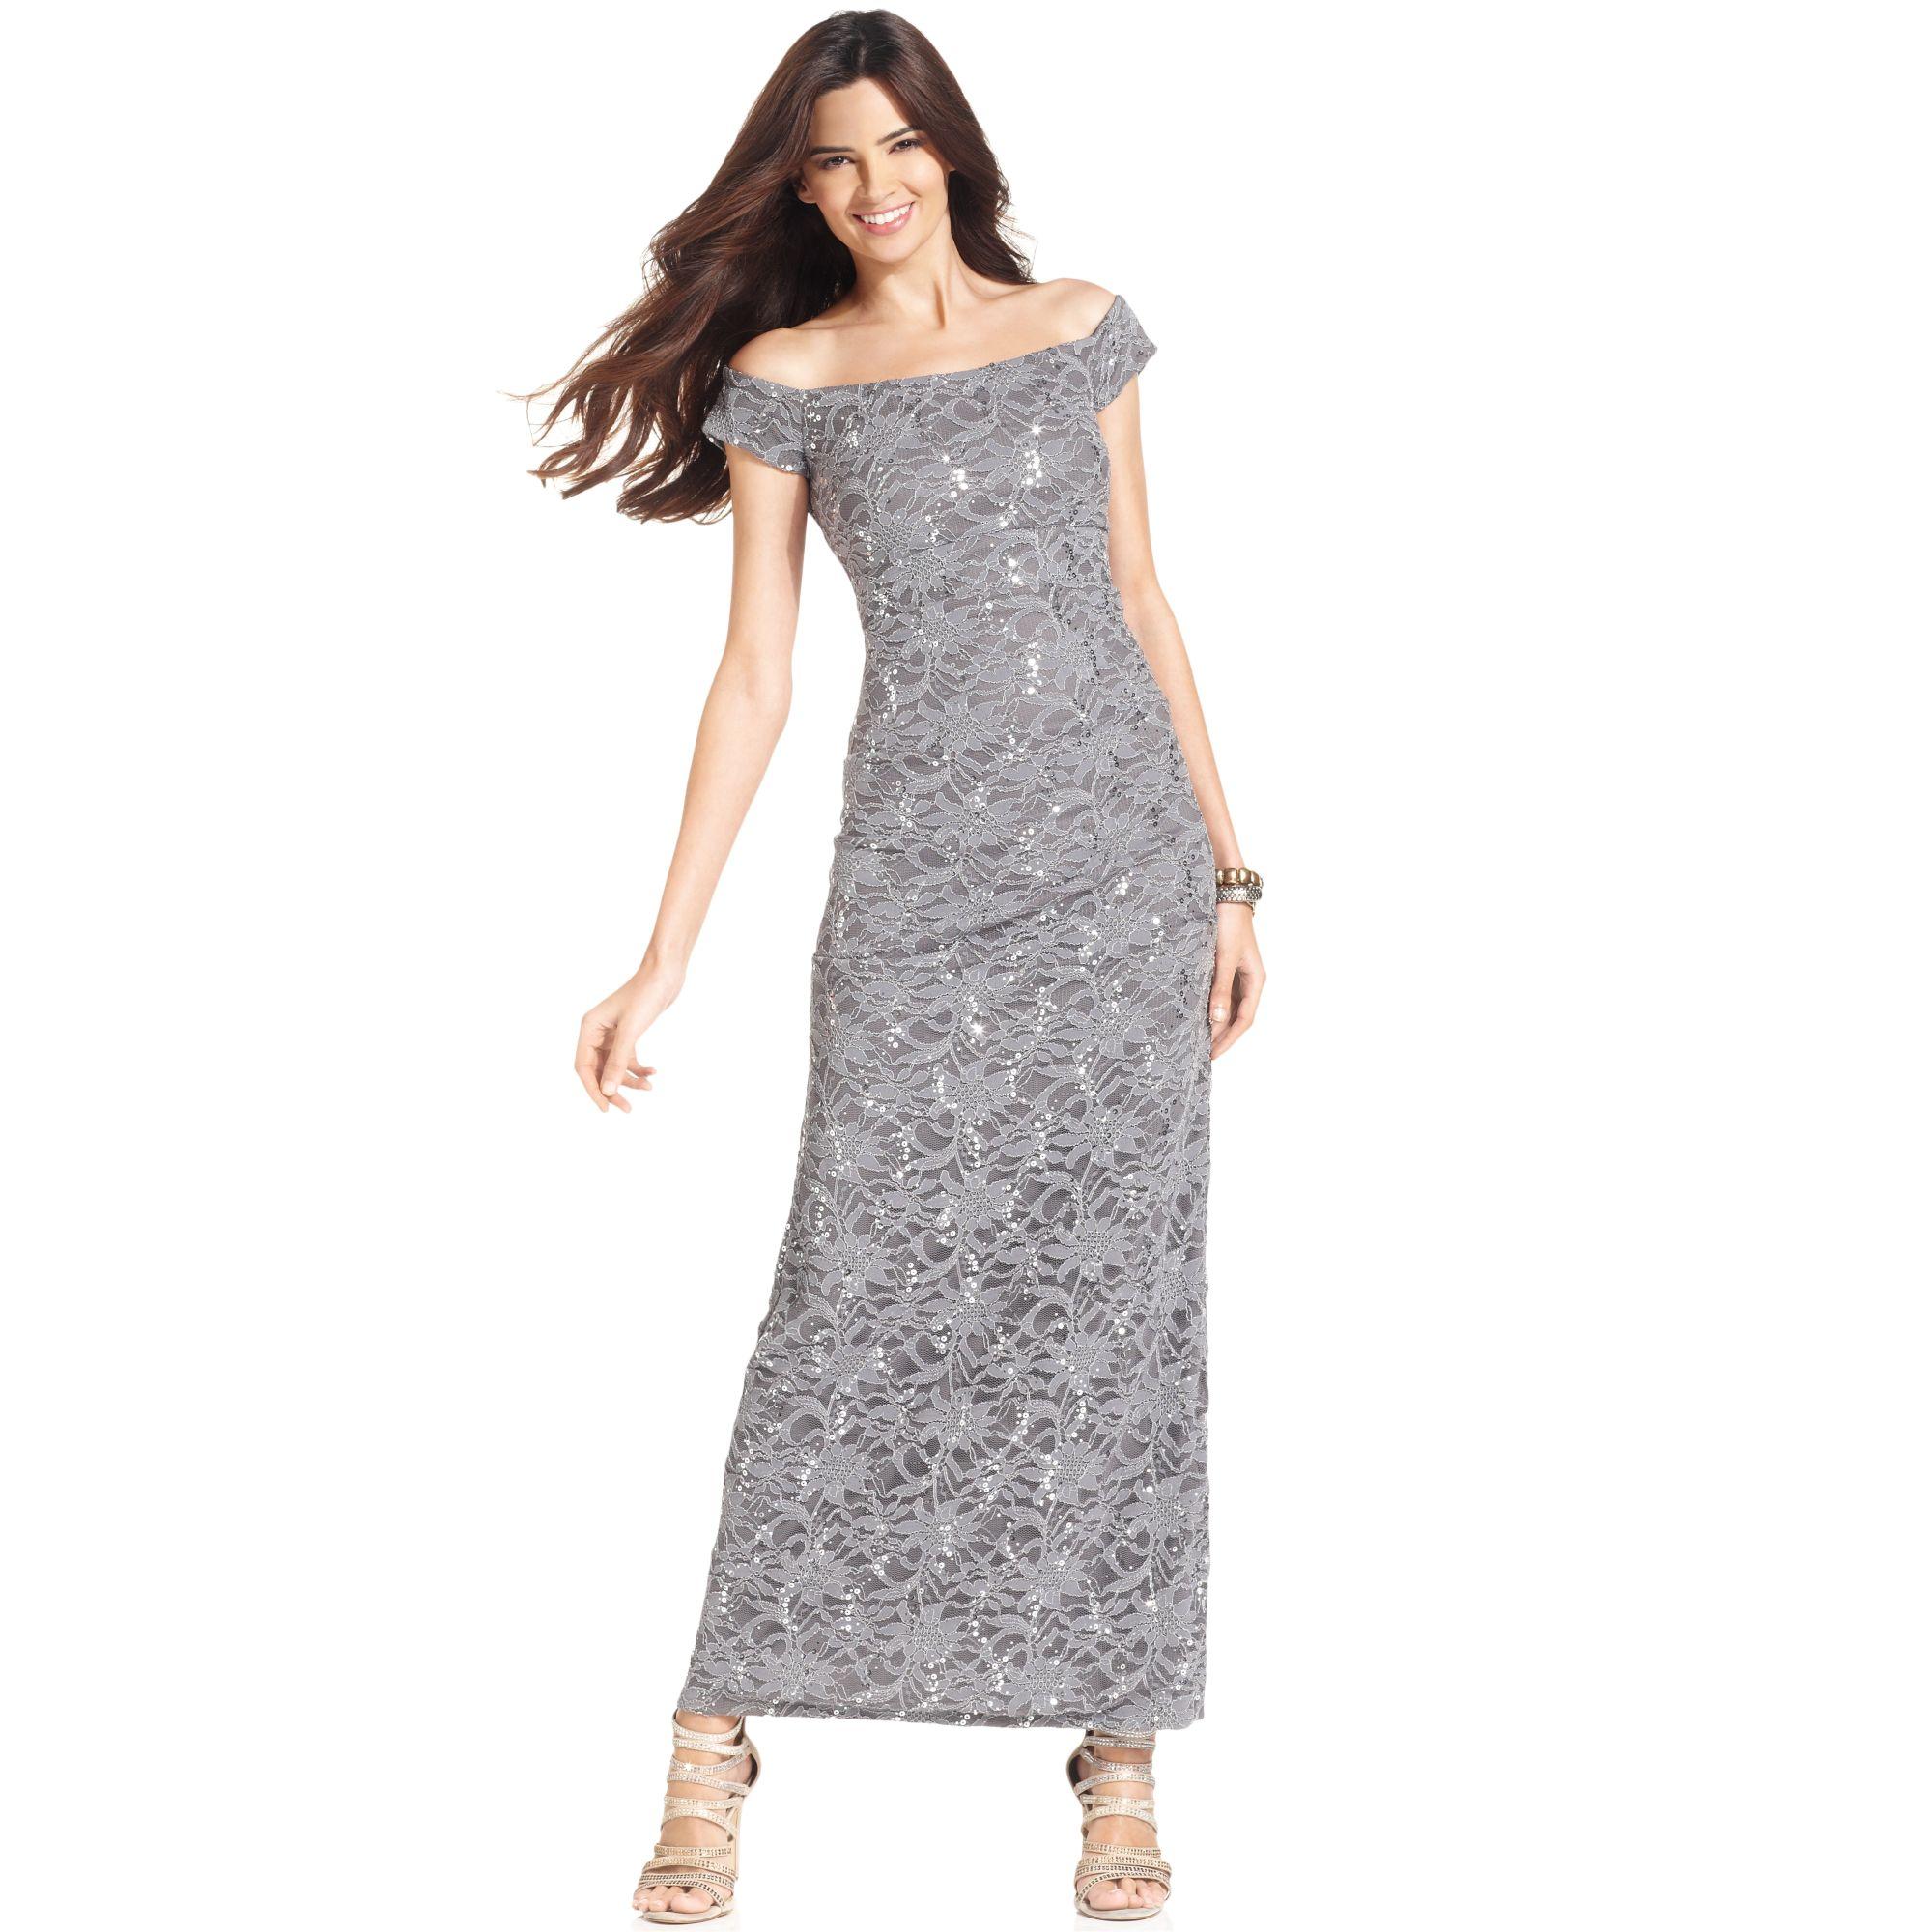 Lyst - Alex Evenings Offtheshoulder Sequin Lace Evening Gown in Metallic